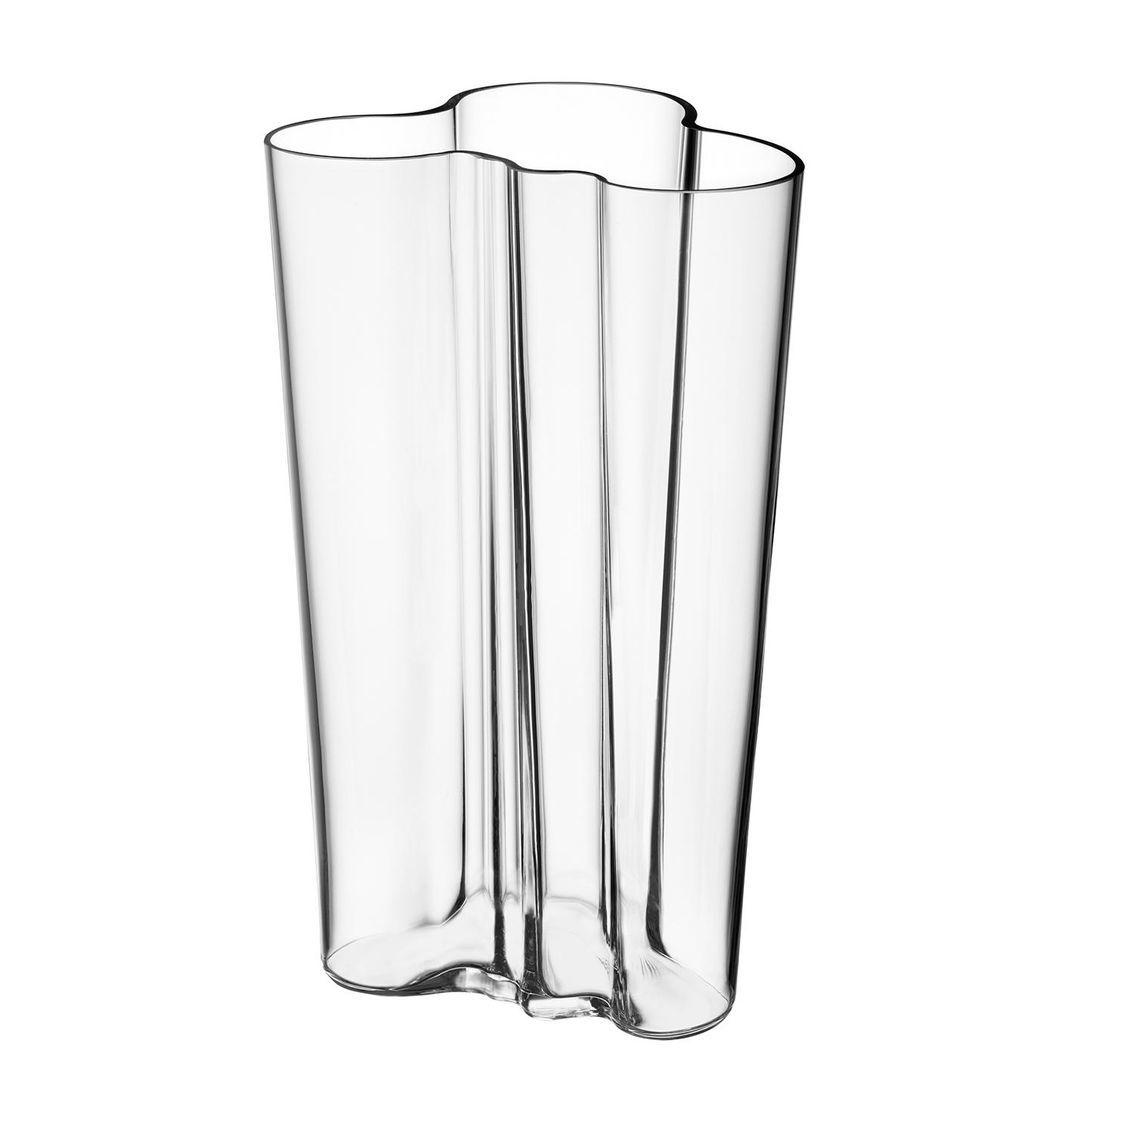 Alvar aalto vase 251mm iittala ambientedirect alvar aalto vase 251mm reviewsmspy